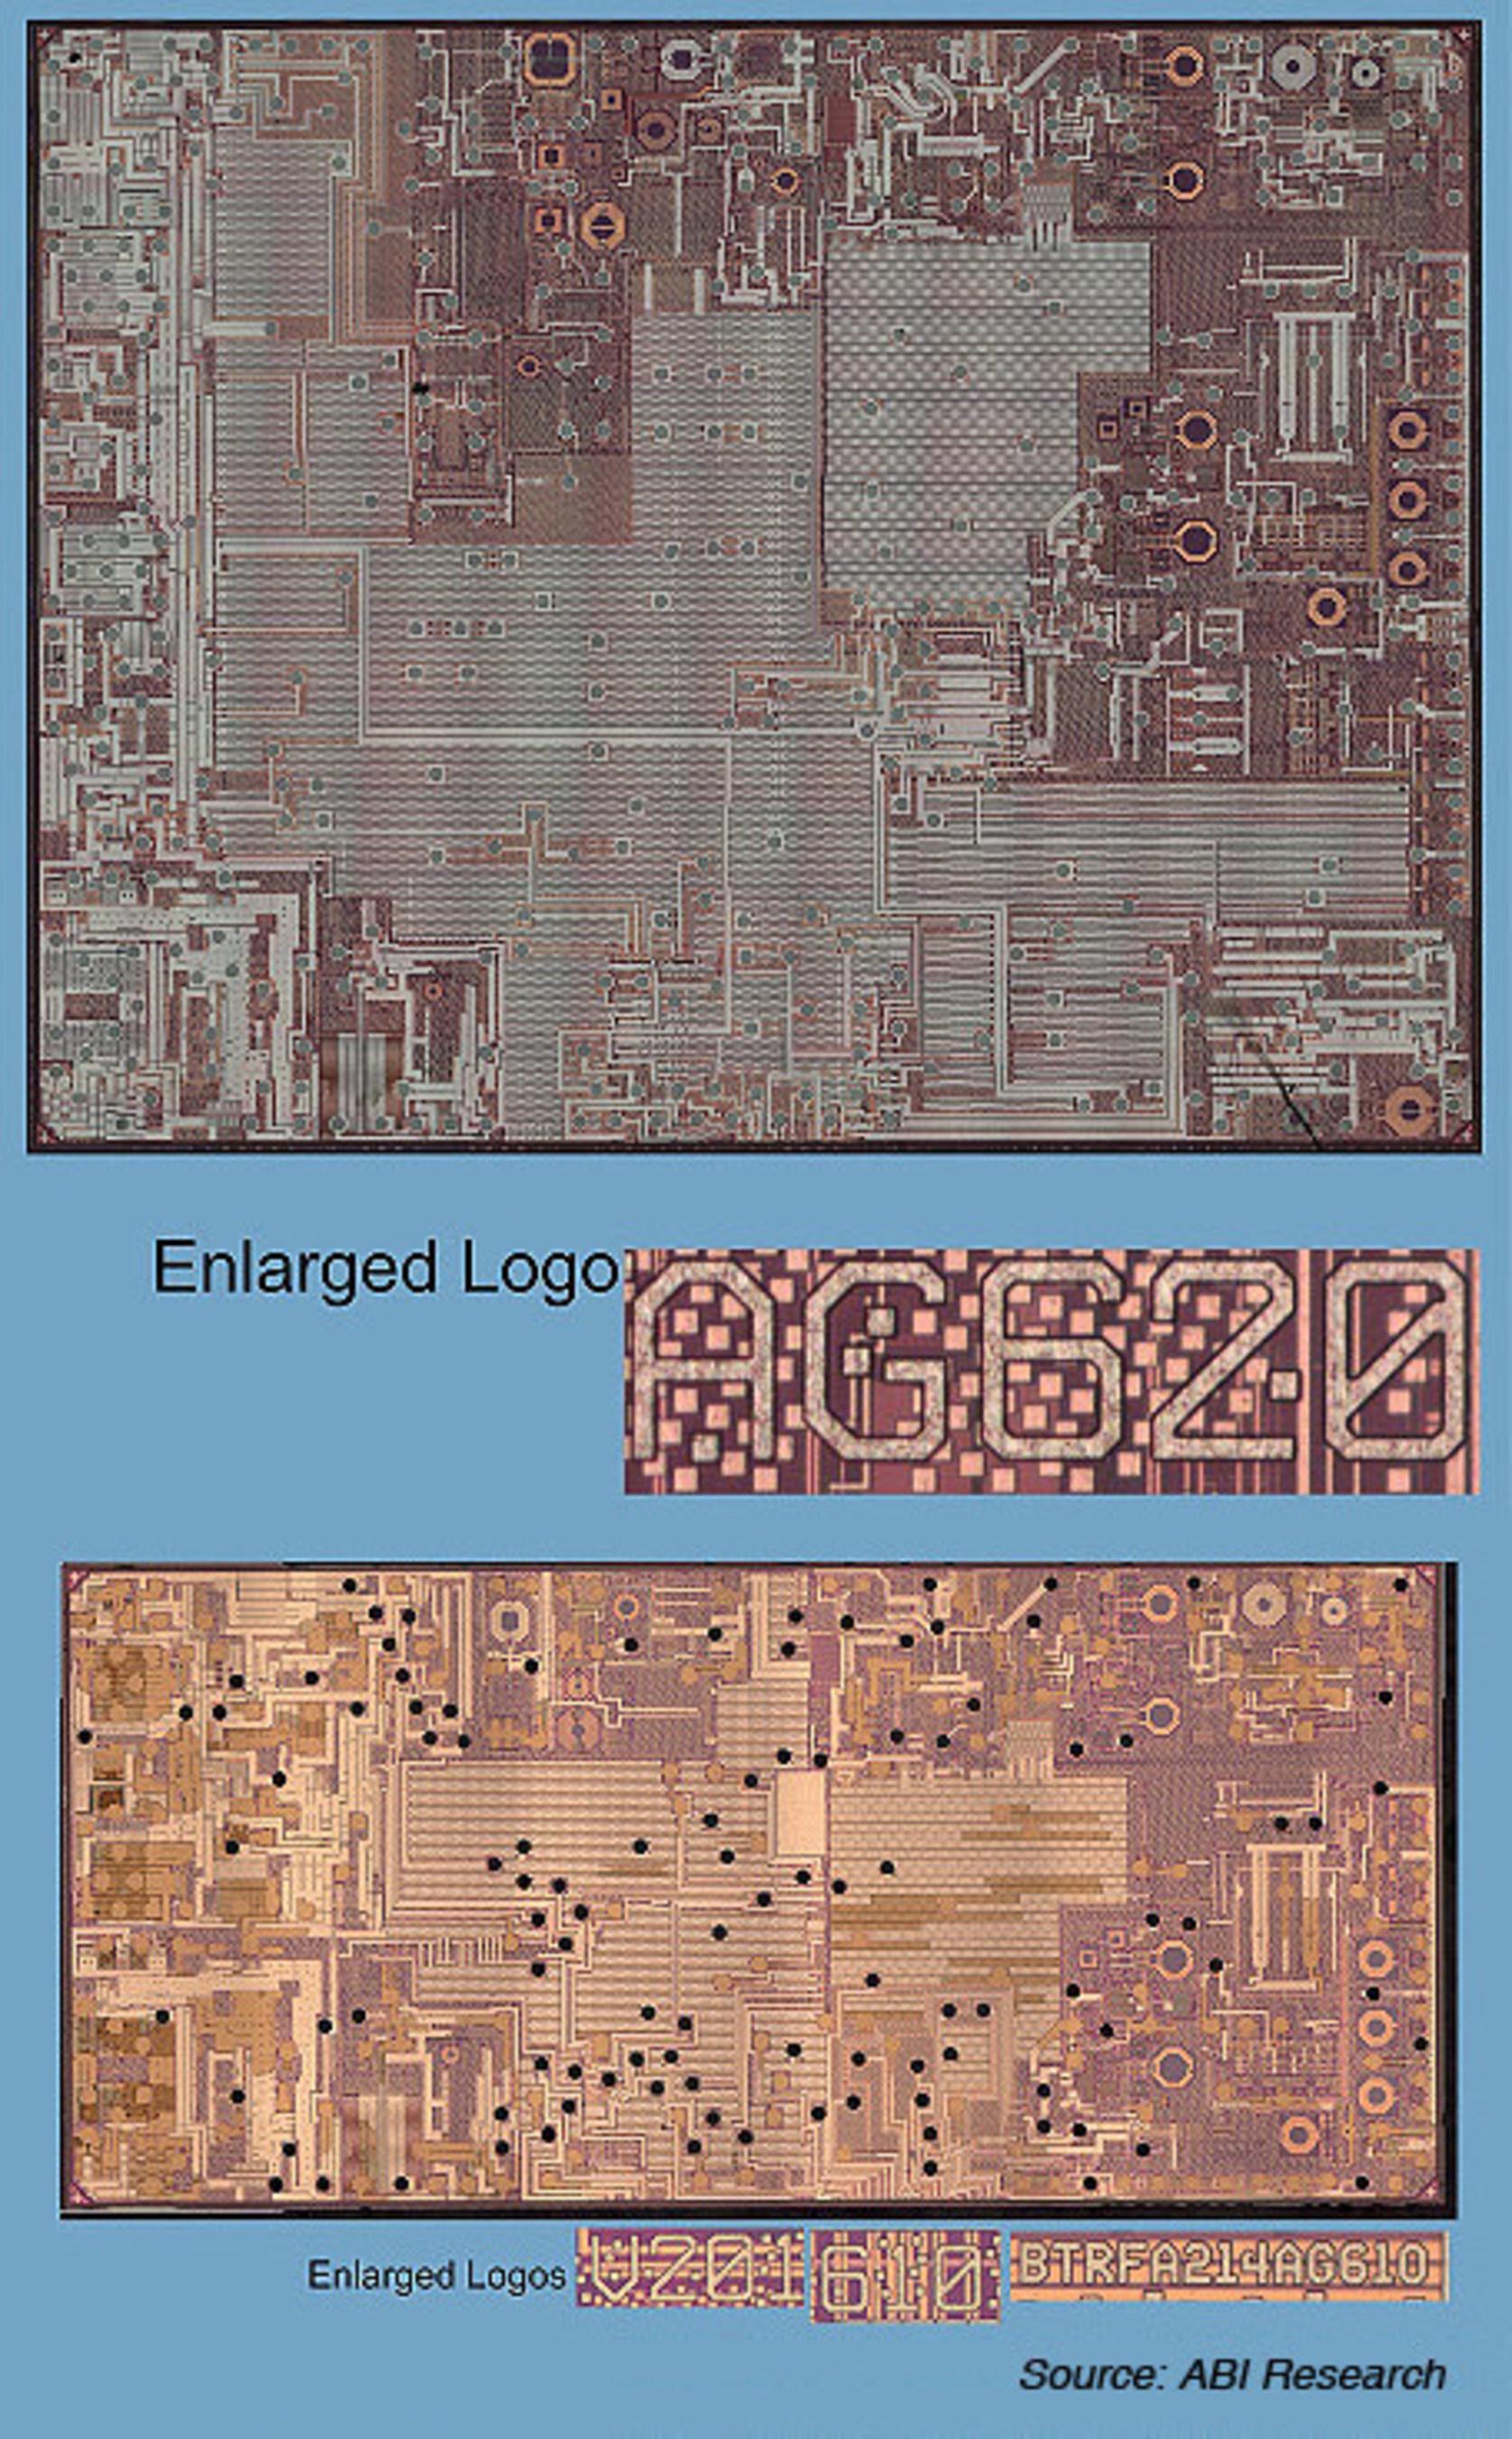 Intel' Takes Integration Down a New Path